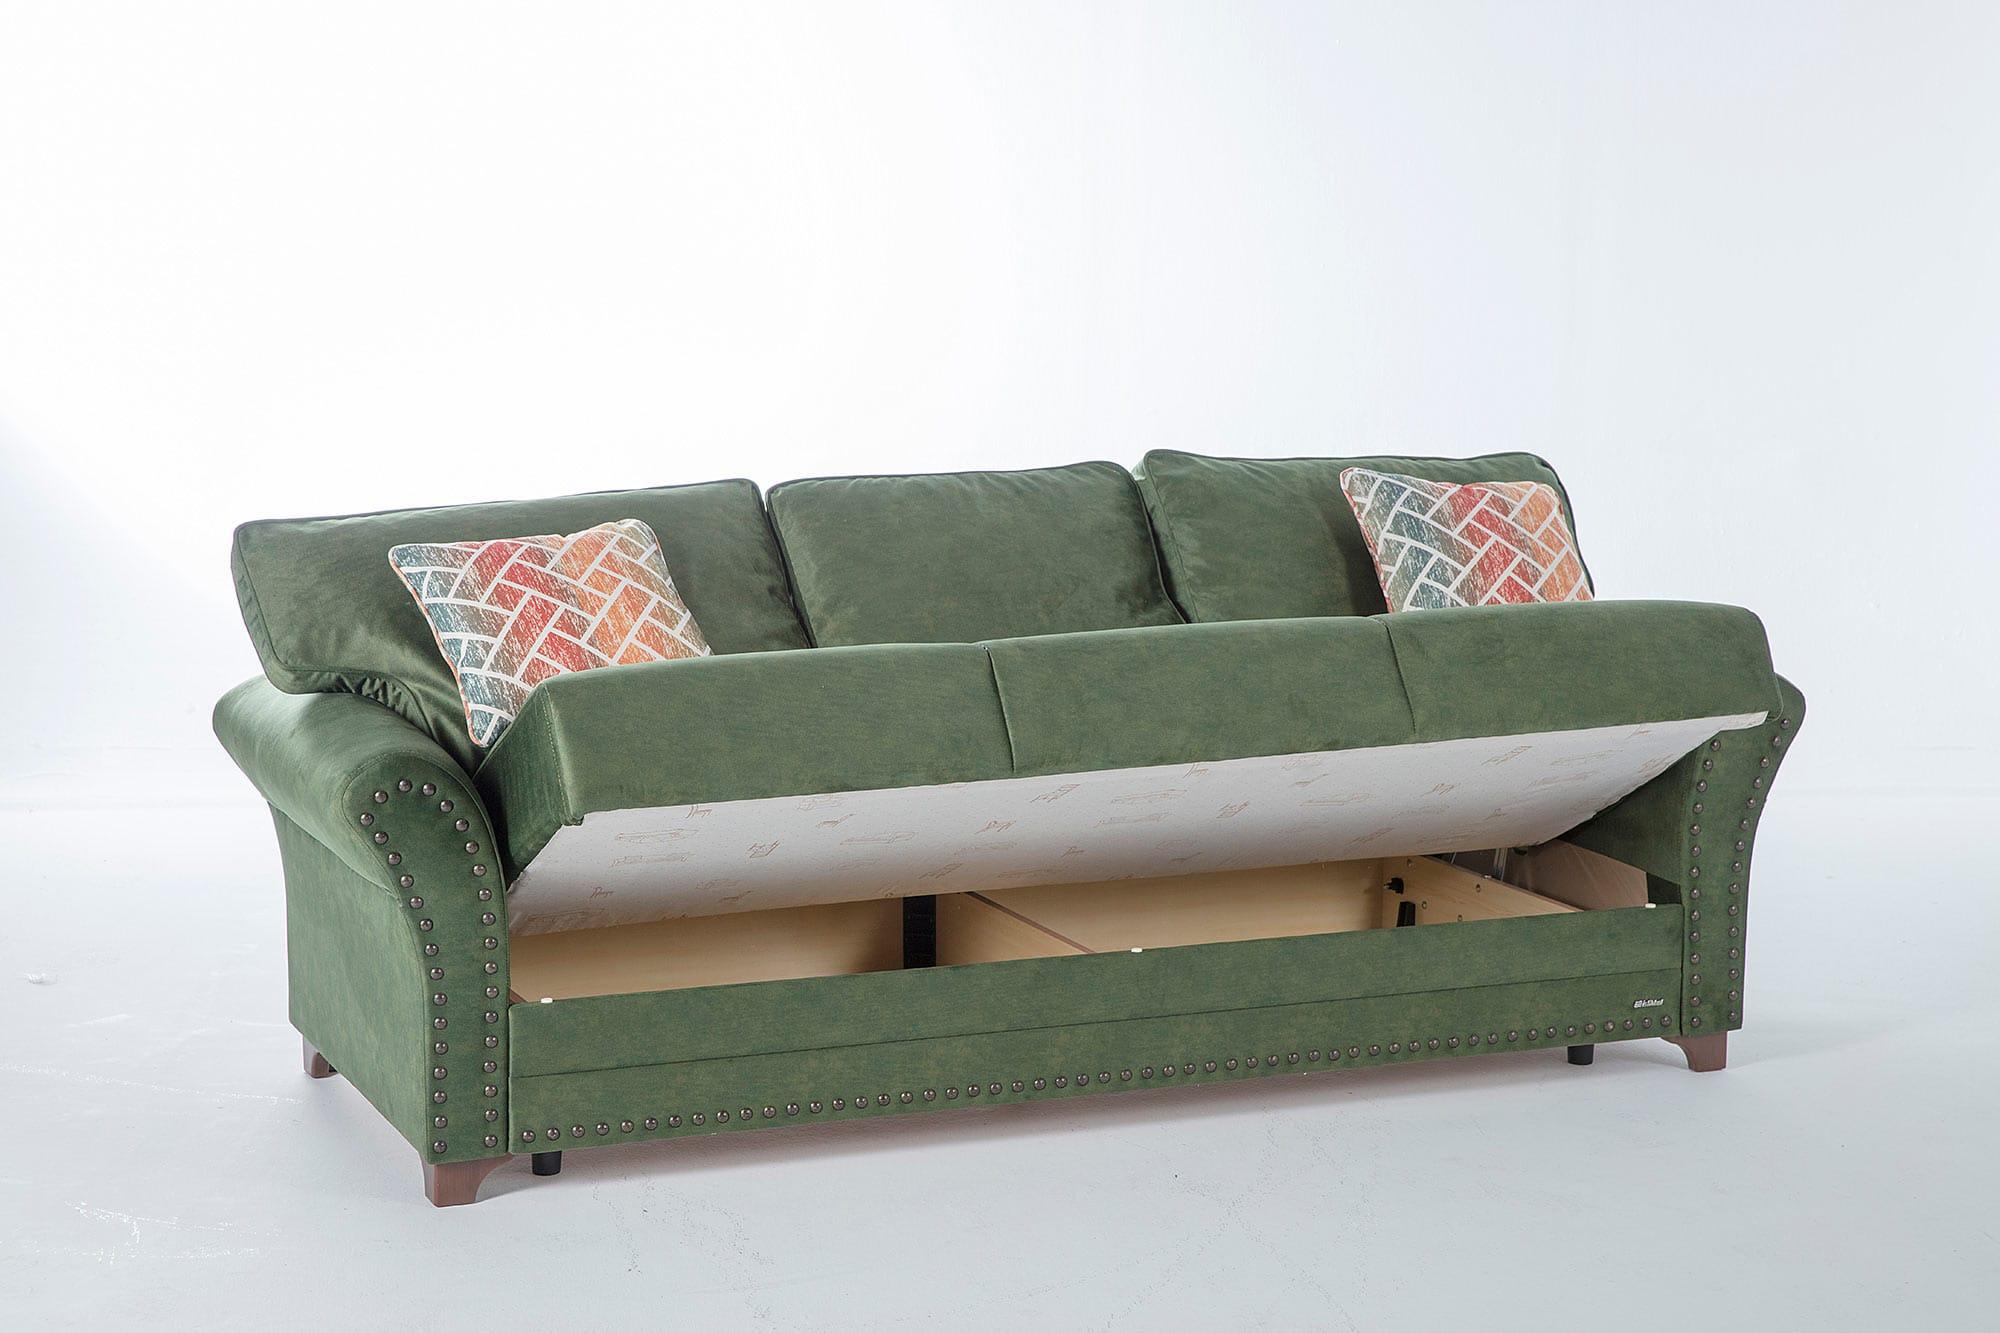 Brady Samba Green w/Memory Foam Convertible Sofa Bed by Istikbal ...